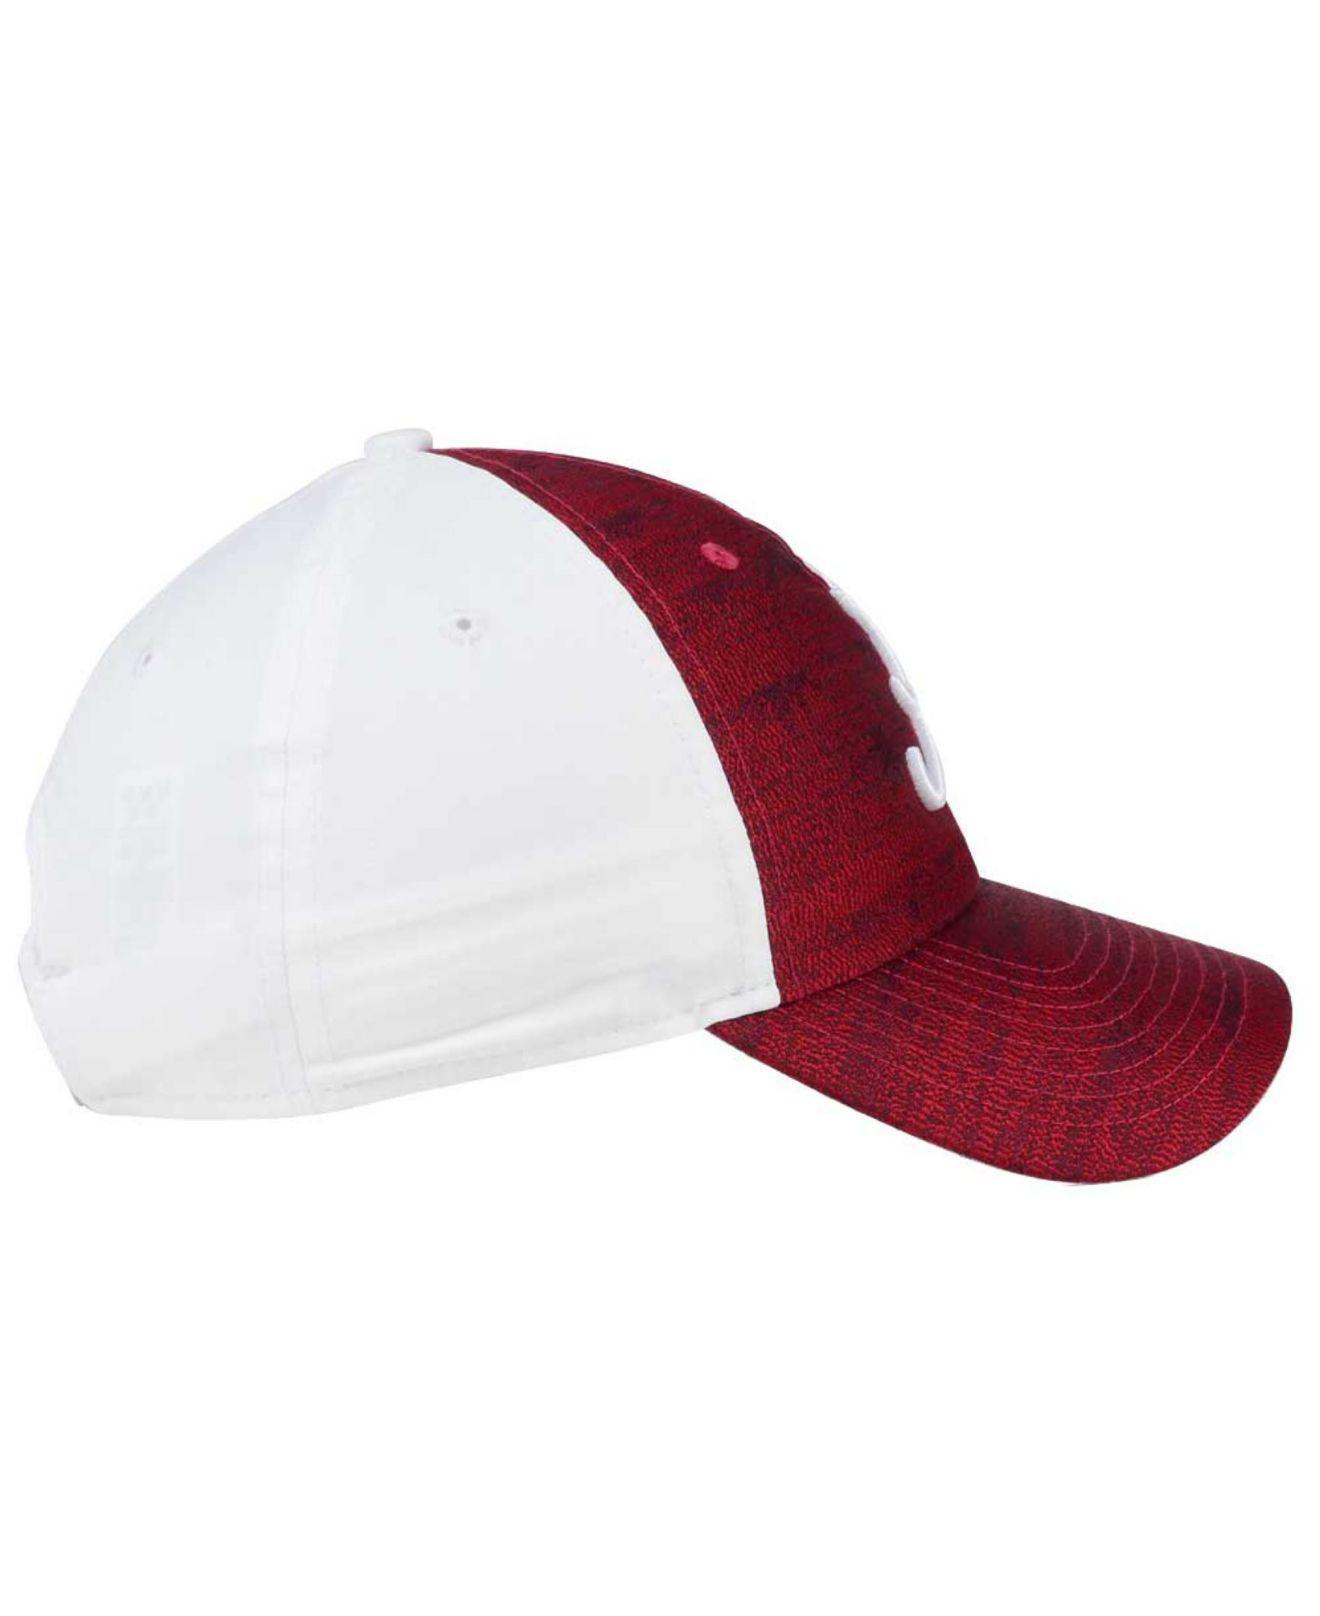 brand new a2b34 0a64a ... where can i buy nike red womens seasonal h86 cap lyst. view fullscreen  fb062 8bd9d